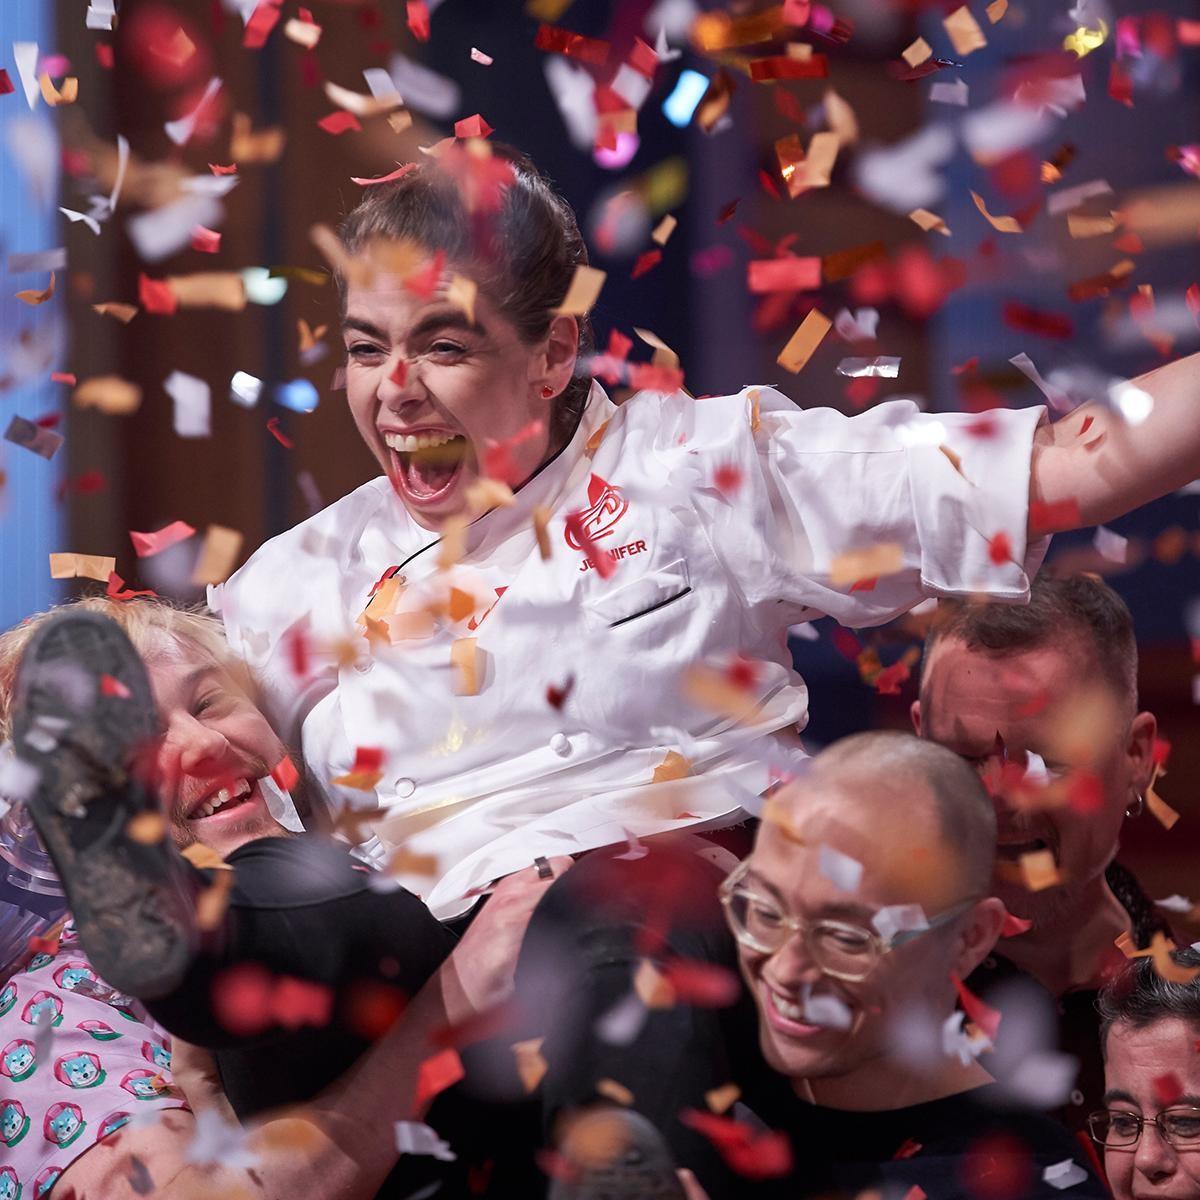 Nova Scotia's Jennifer Crawford crowned winner of MasterChef